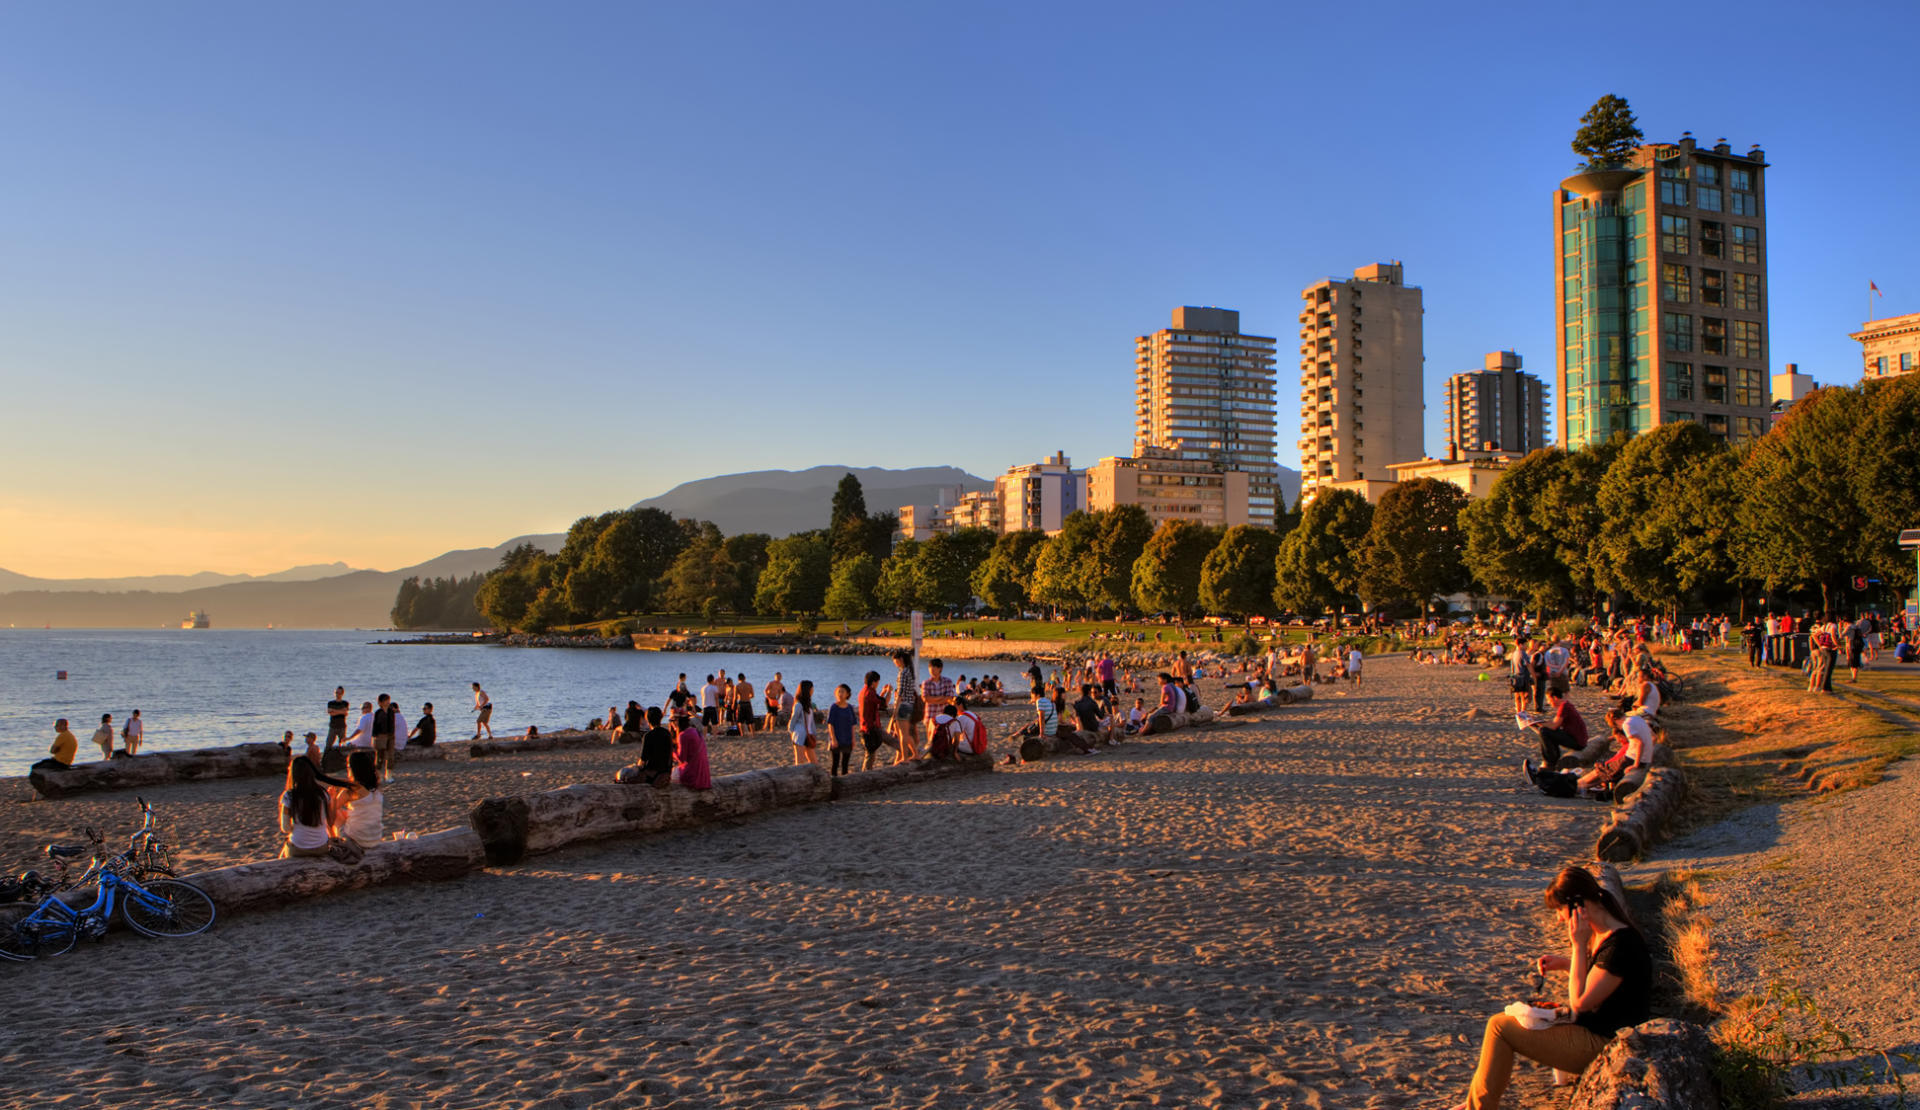 Vancouver beach at gloaming.